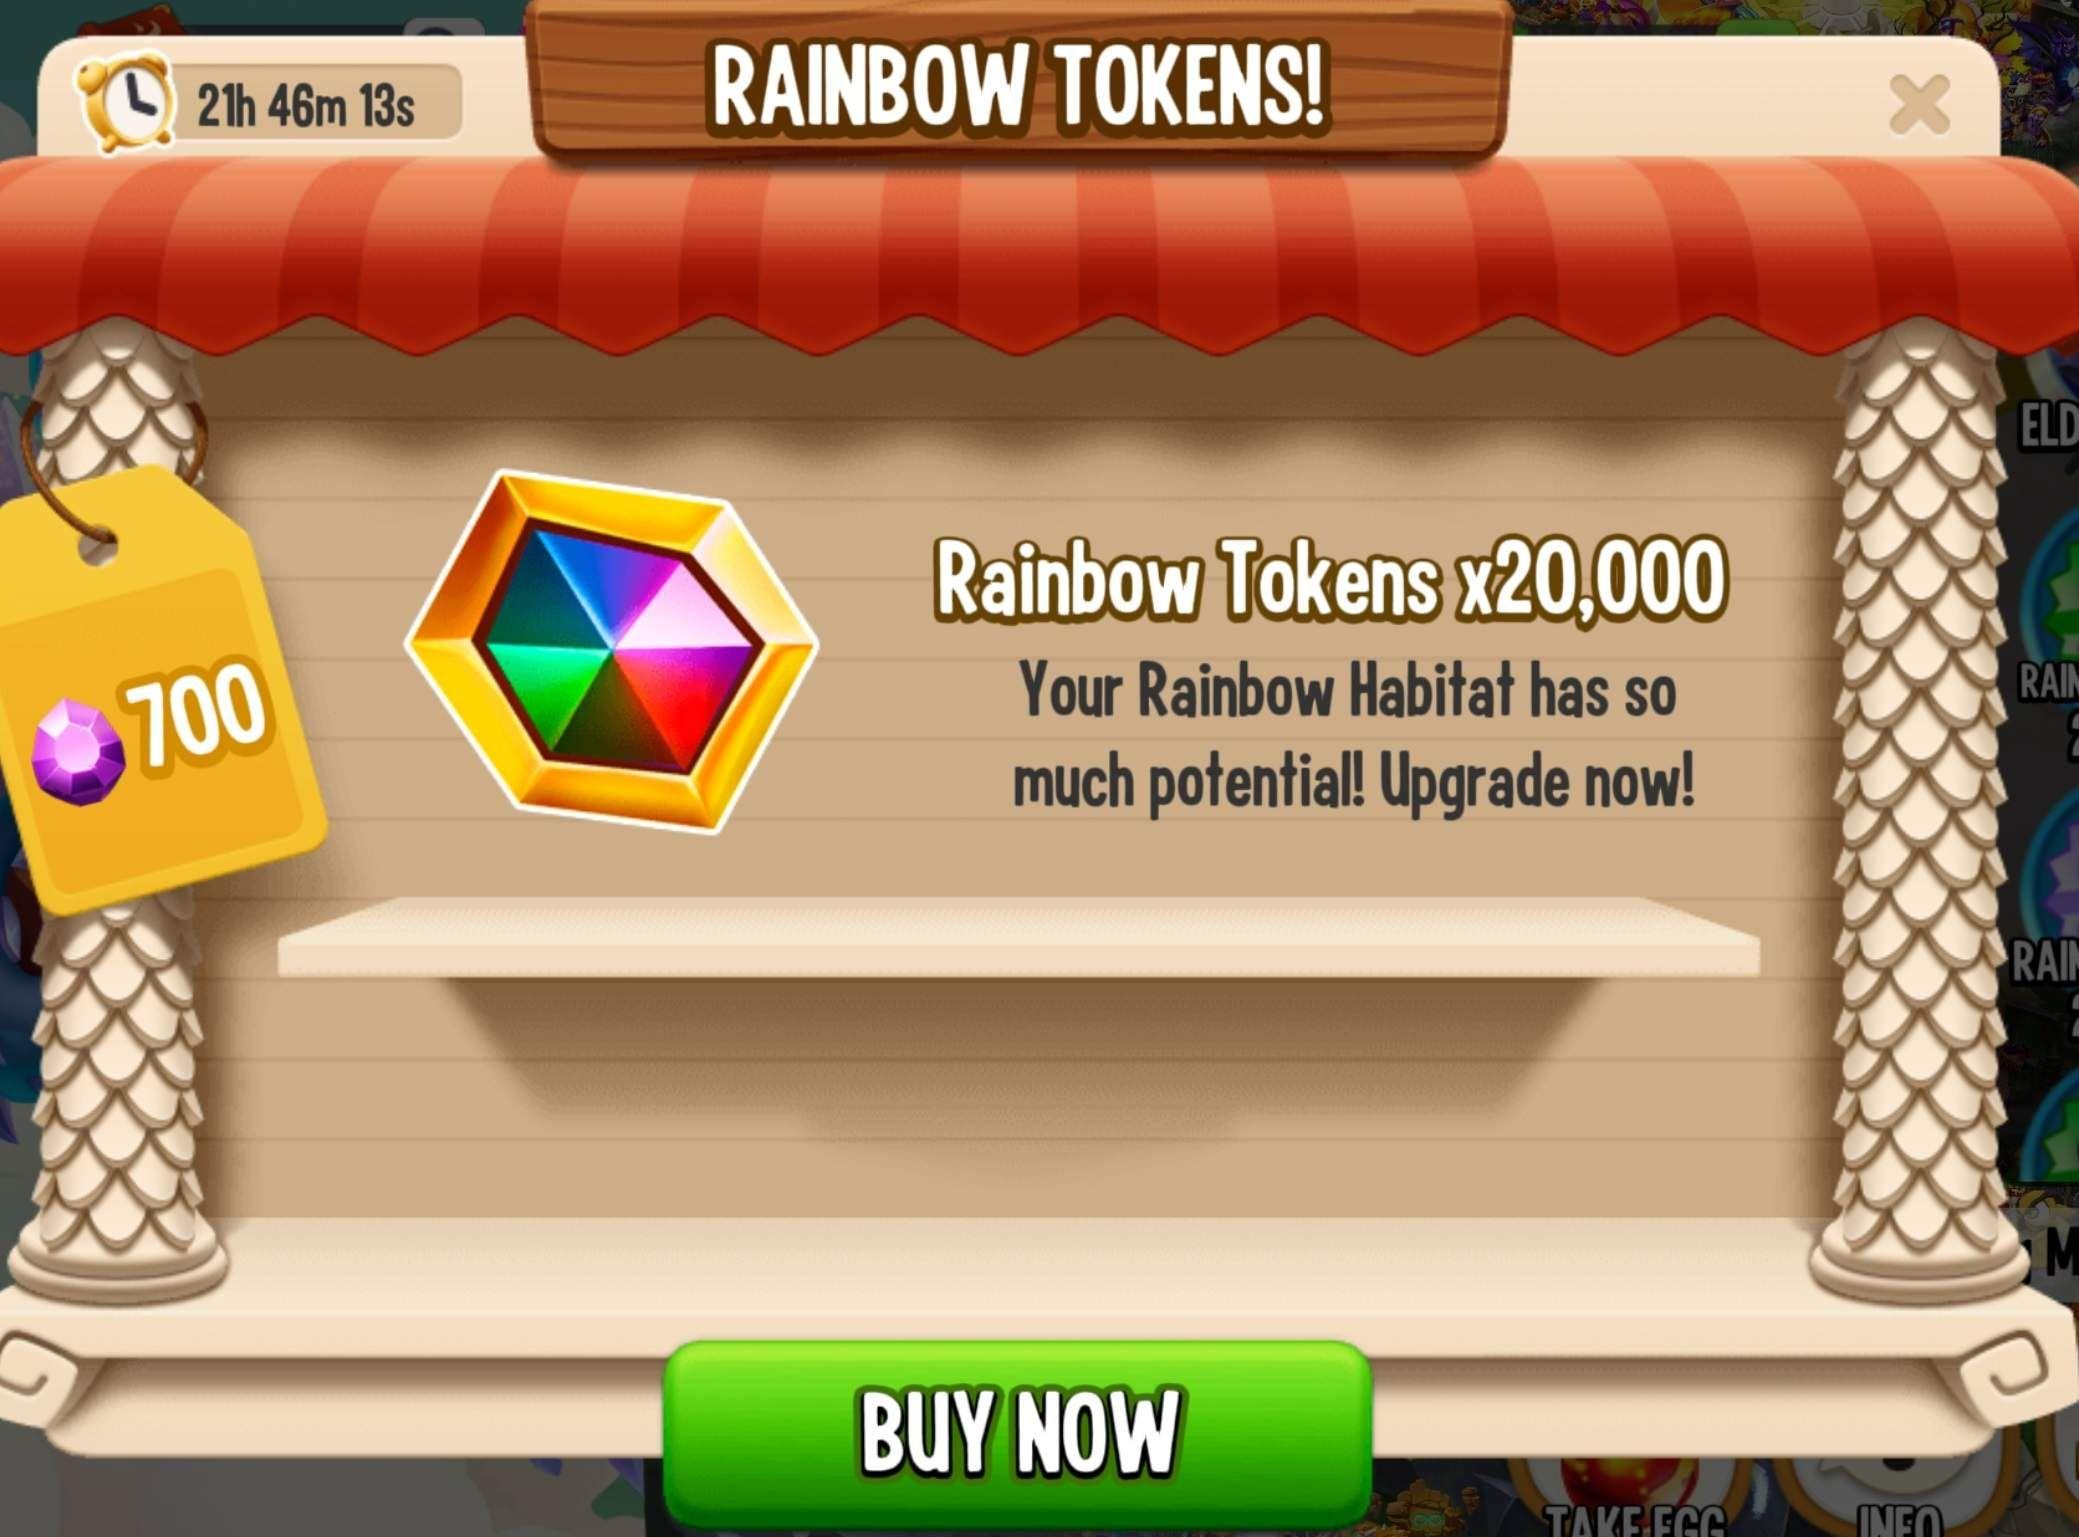 0_1619267641166_042421 rainbow tokens.jpg